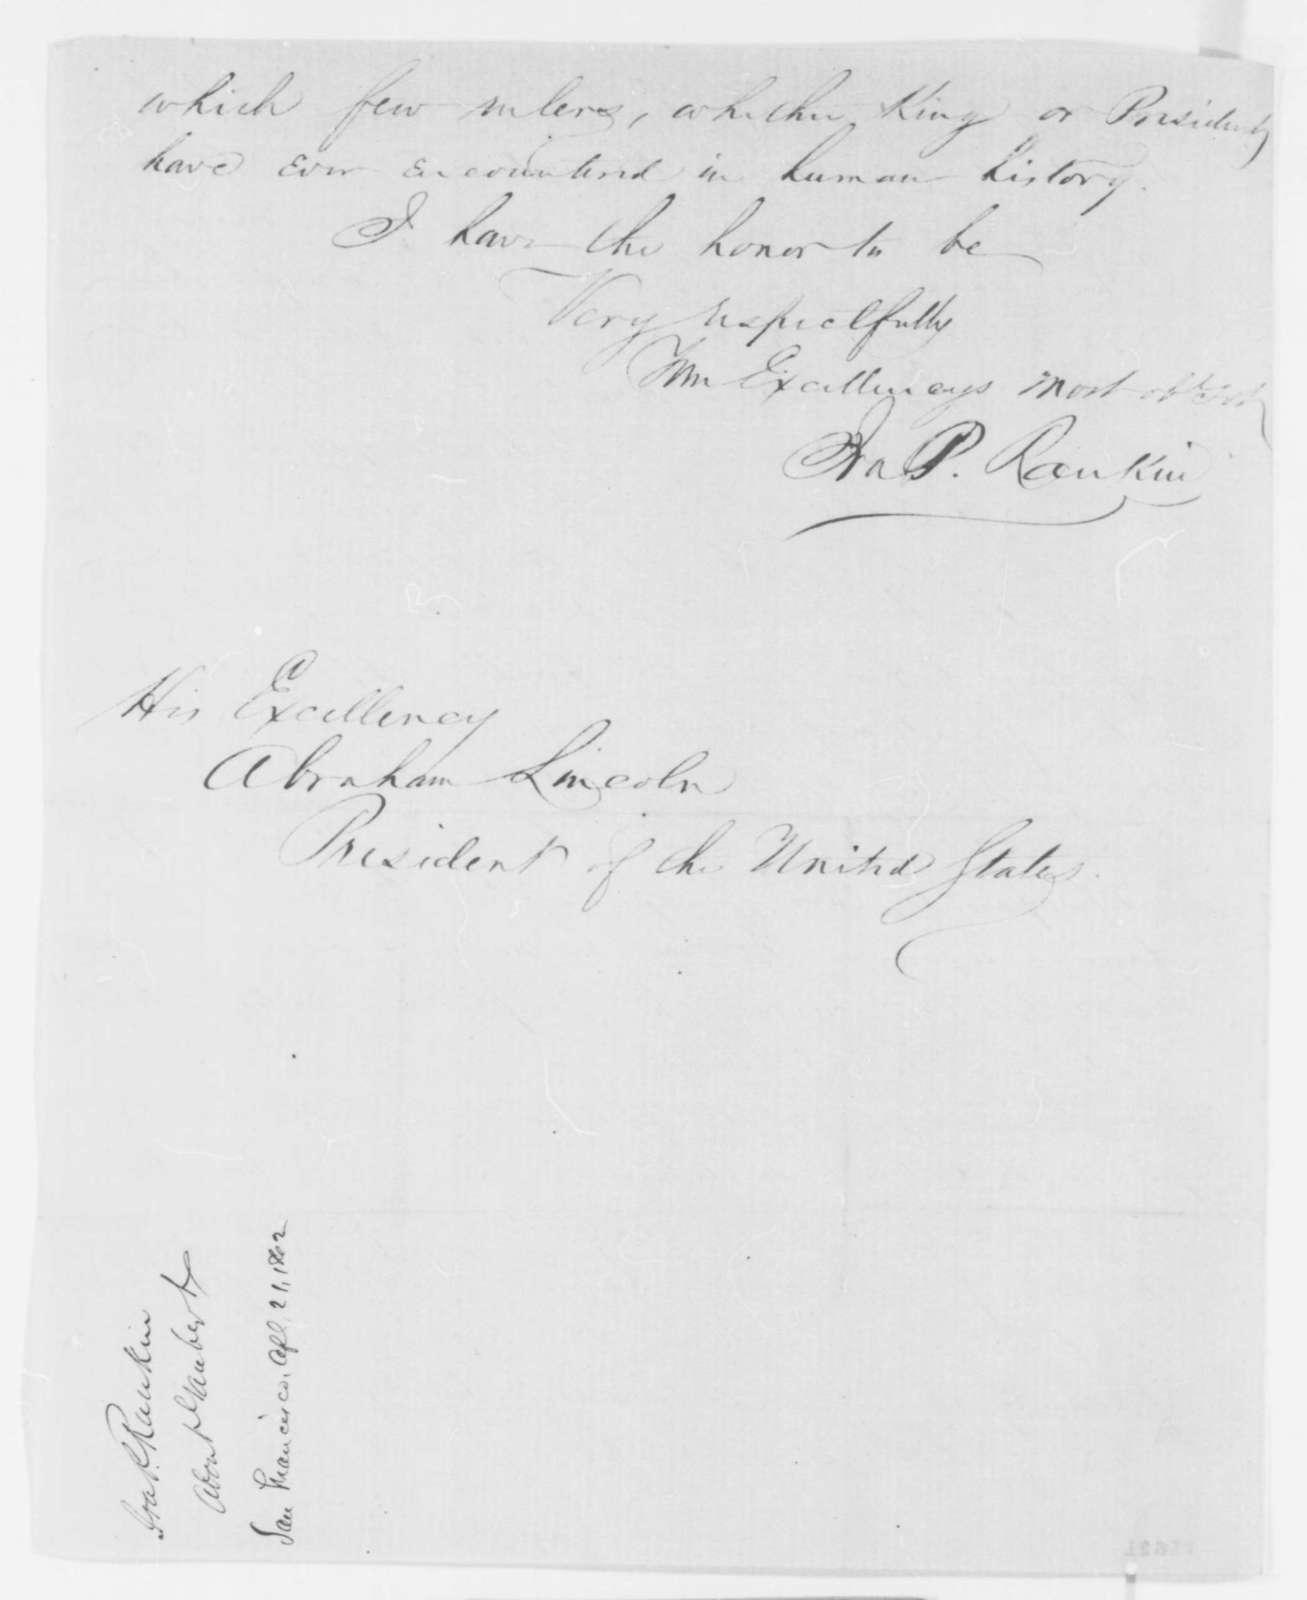 Ira P. Rankin to Abraham Lincoln, Monday, April 21, 1862  (Personal affairs)